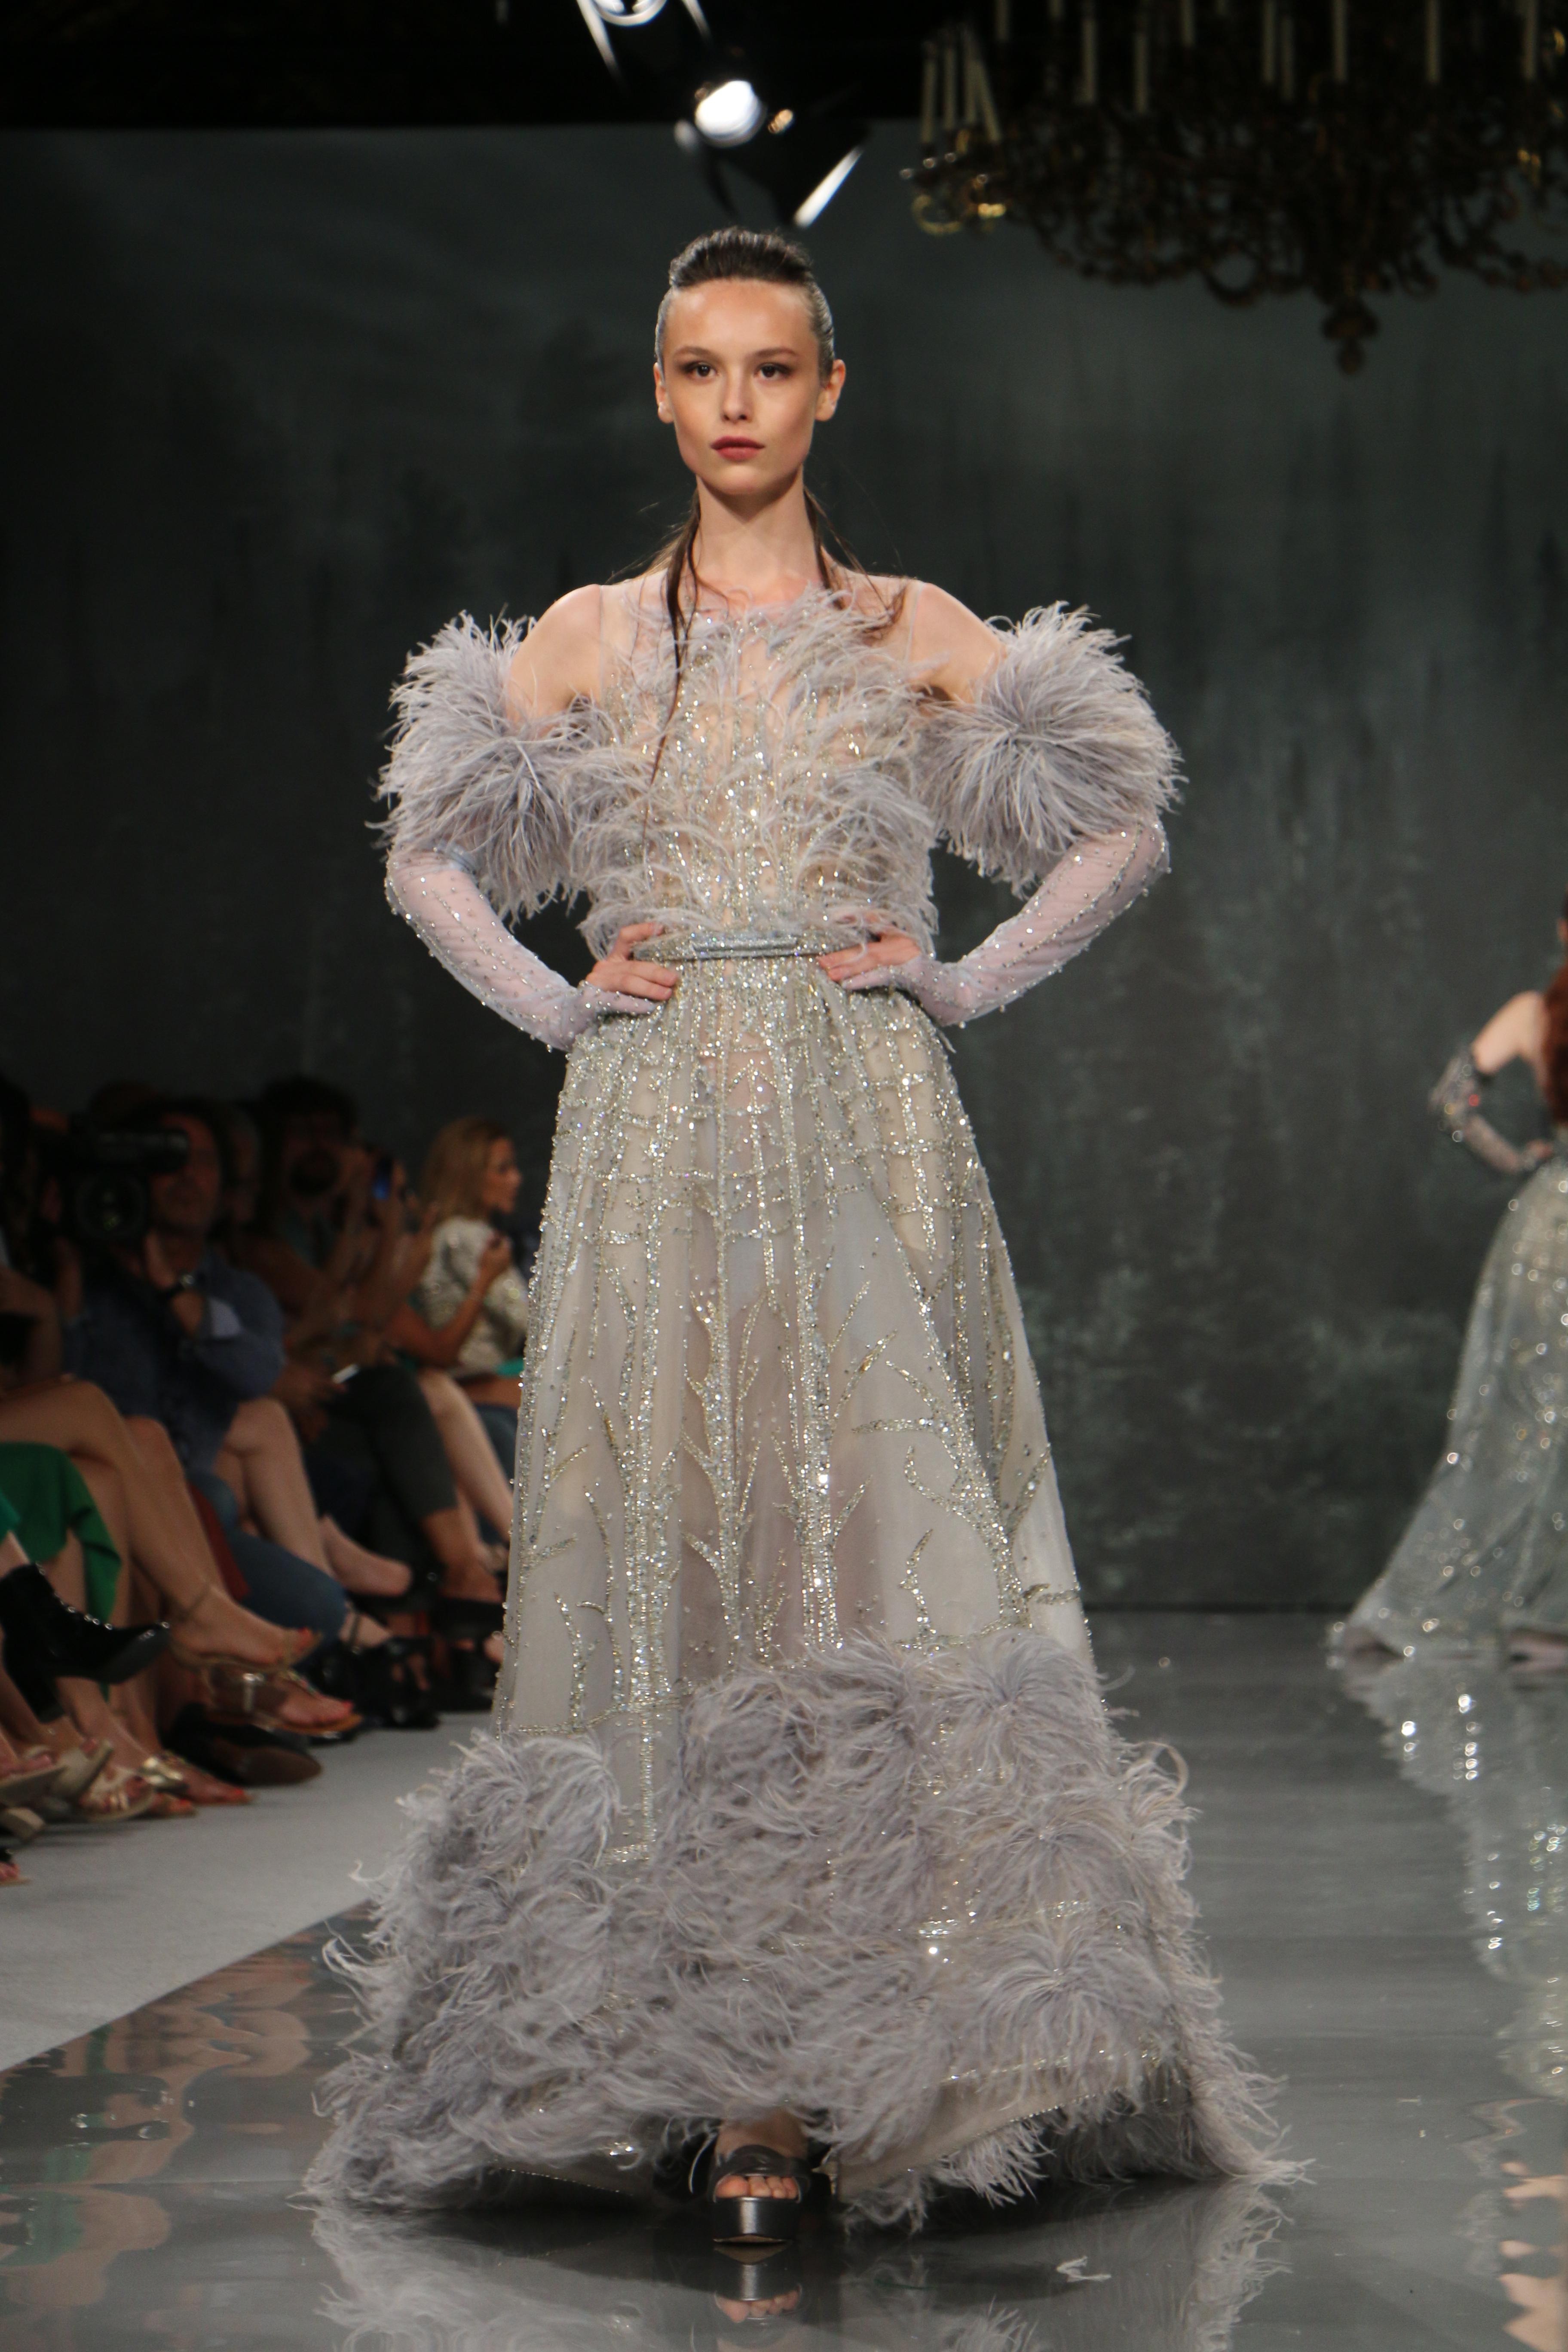 Défilé Ziad Nakad Haute Couture 2018-2019